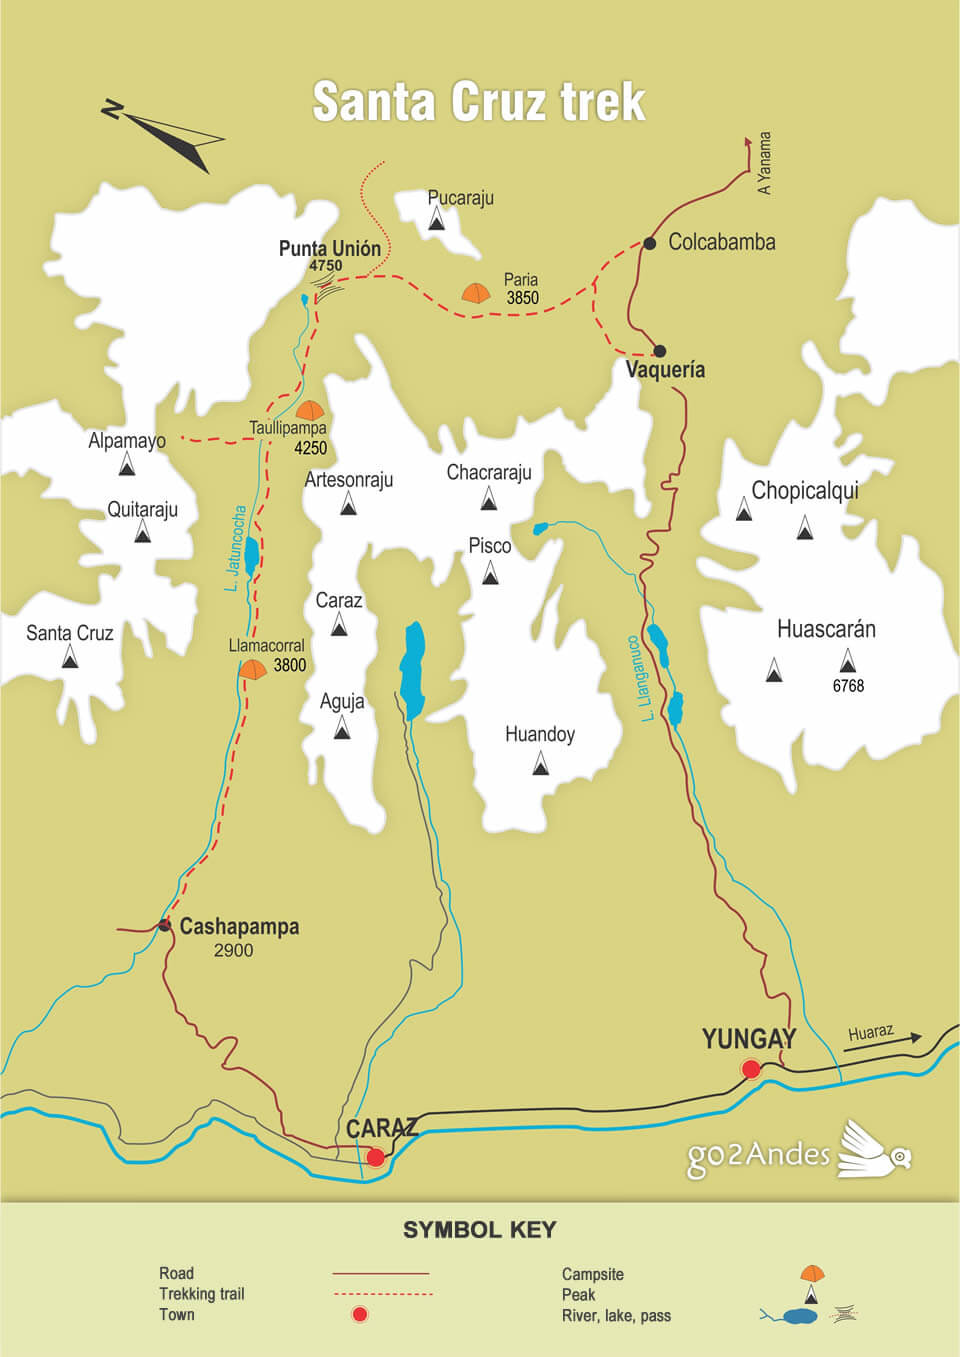 Santa Cruz trek map, Cordillera Blanca